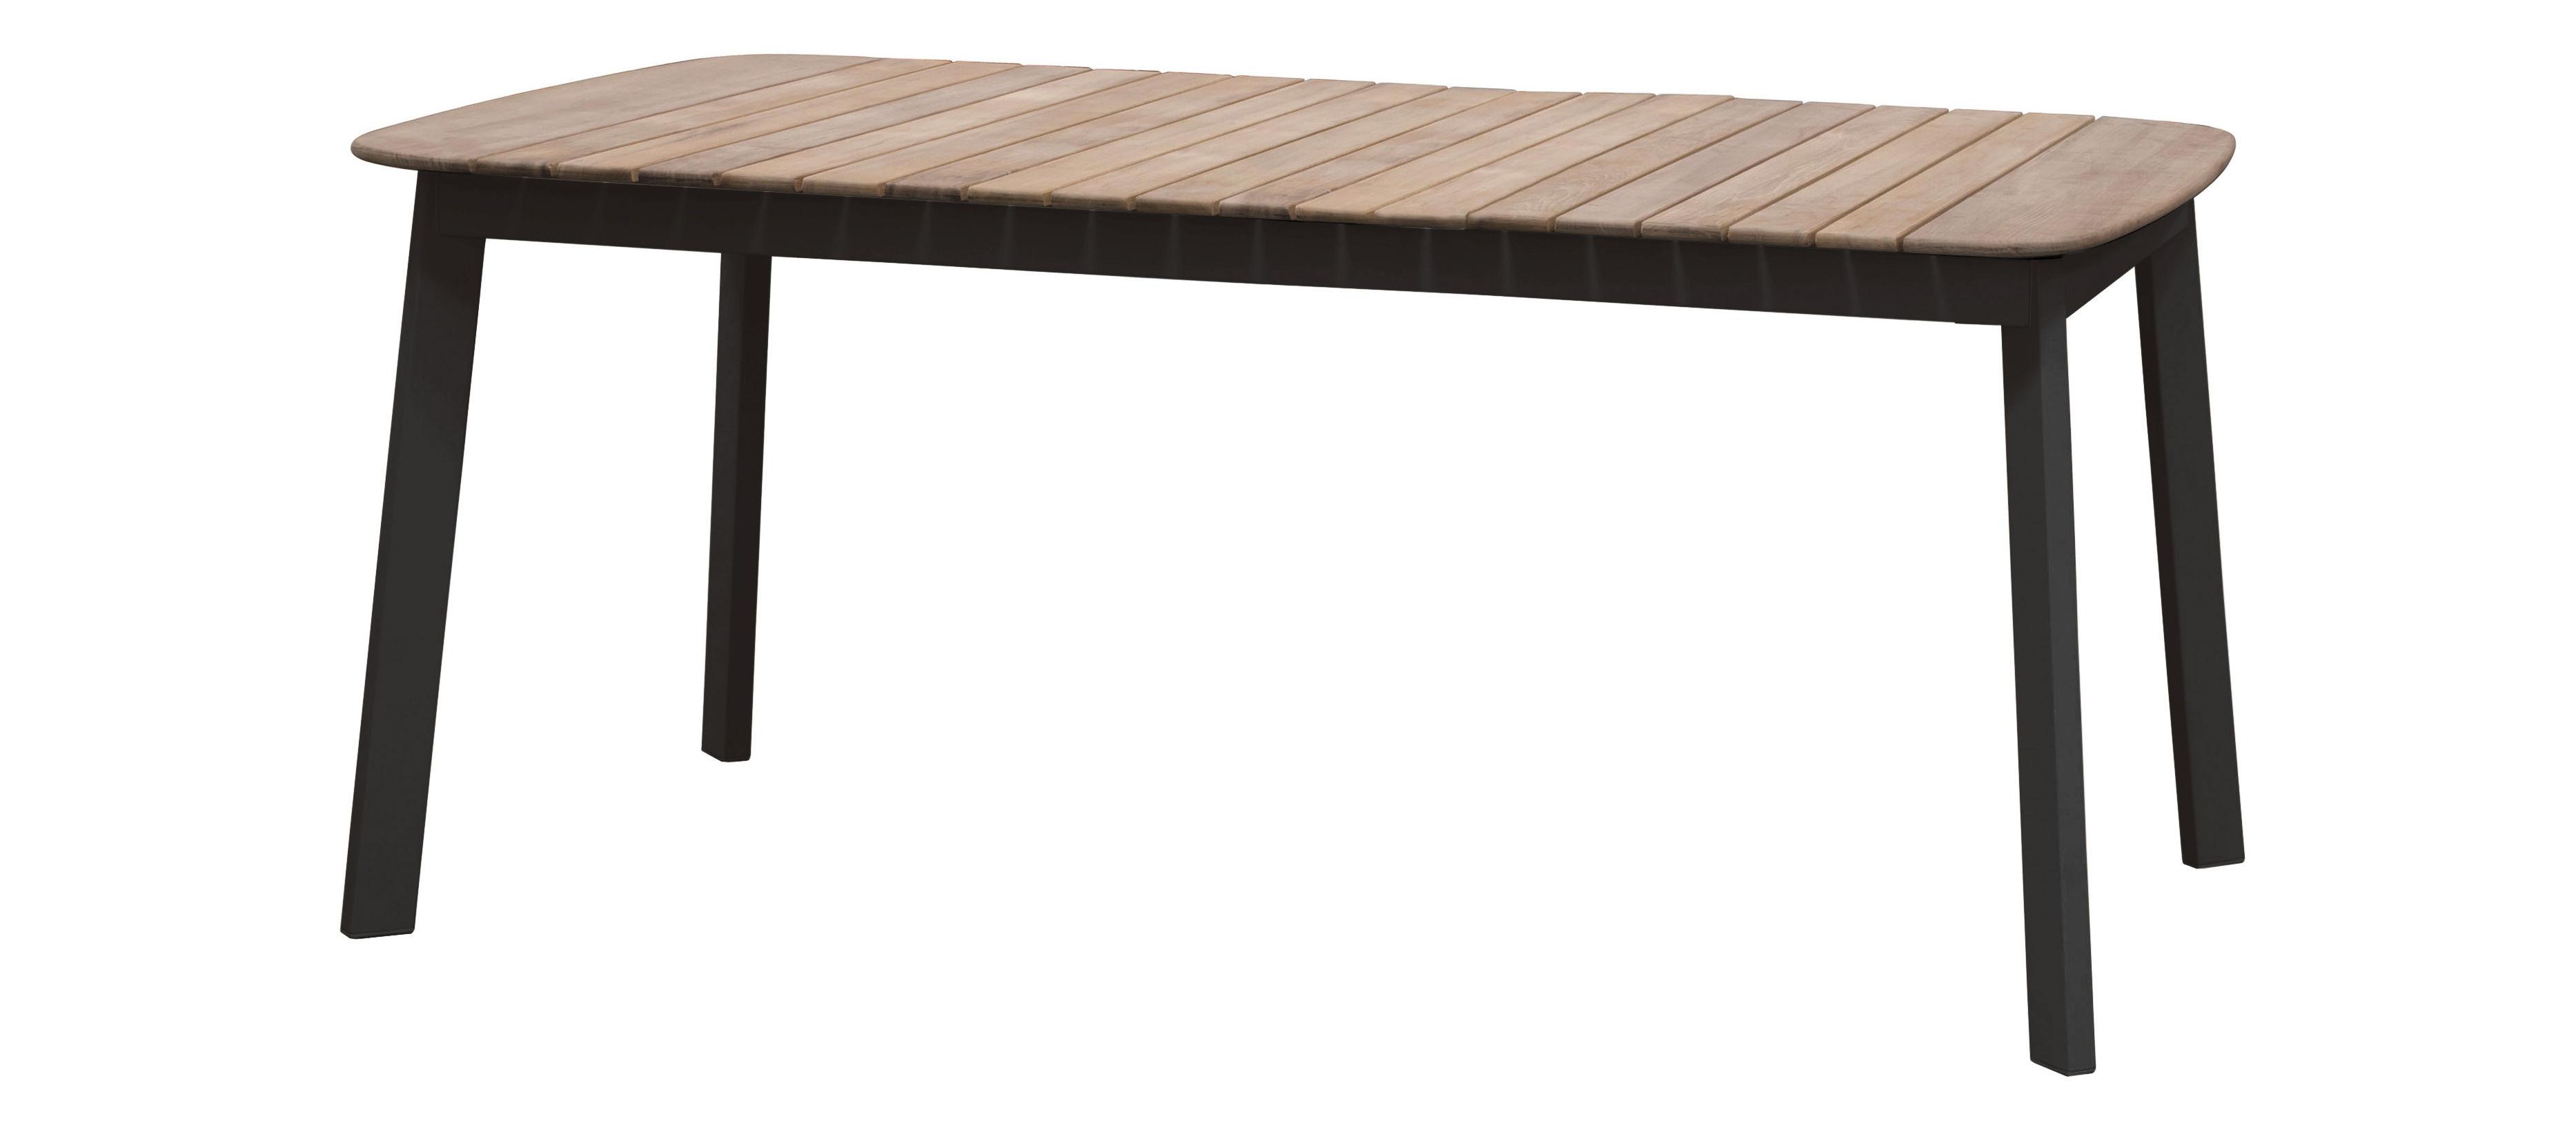 table shine plateau teck 166 x 100 cm noir plateau teck emu made in design. Black Bedroom Furniture Sets. Home Design Ideas